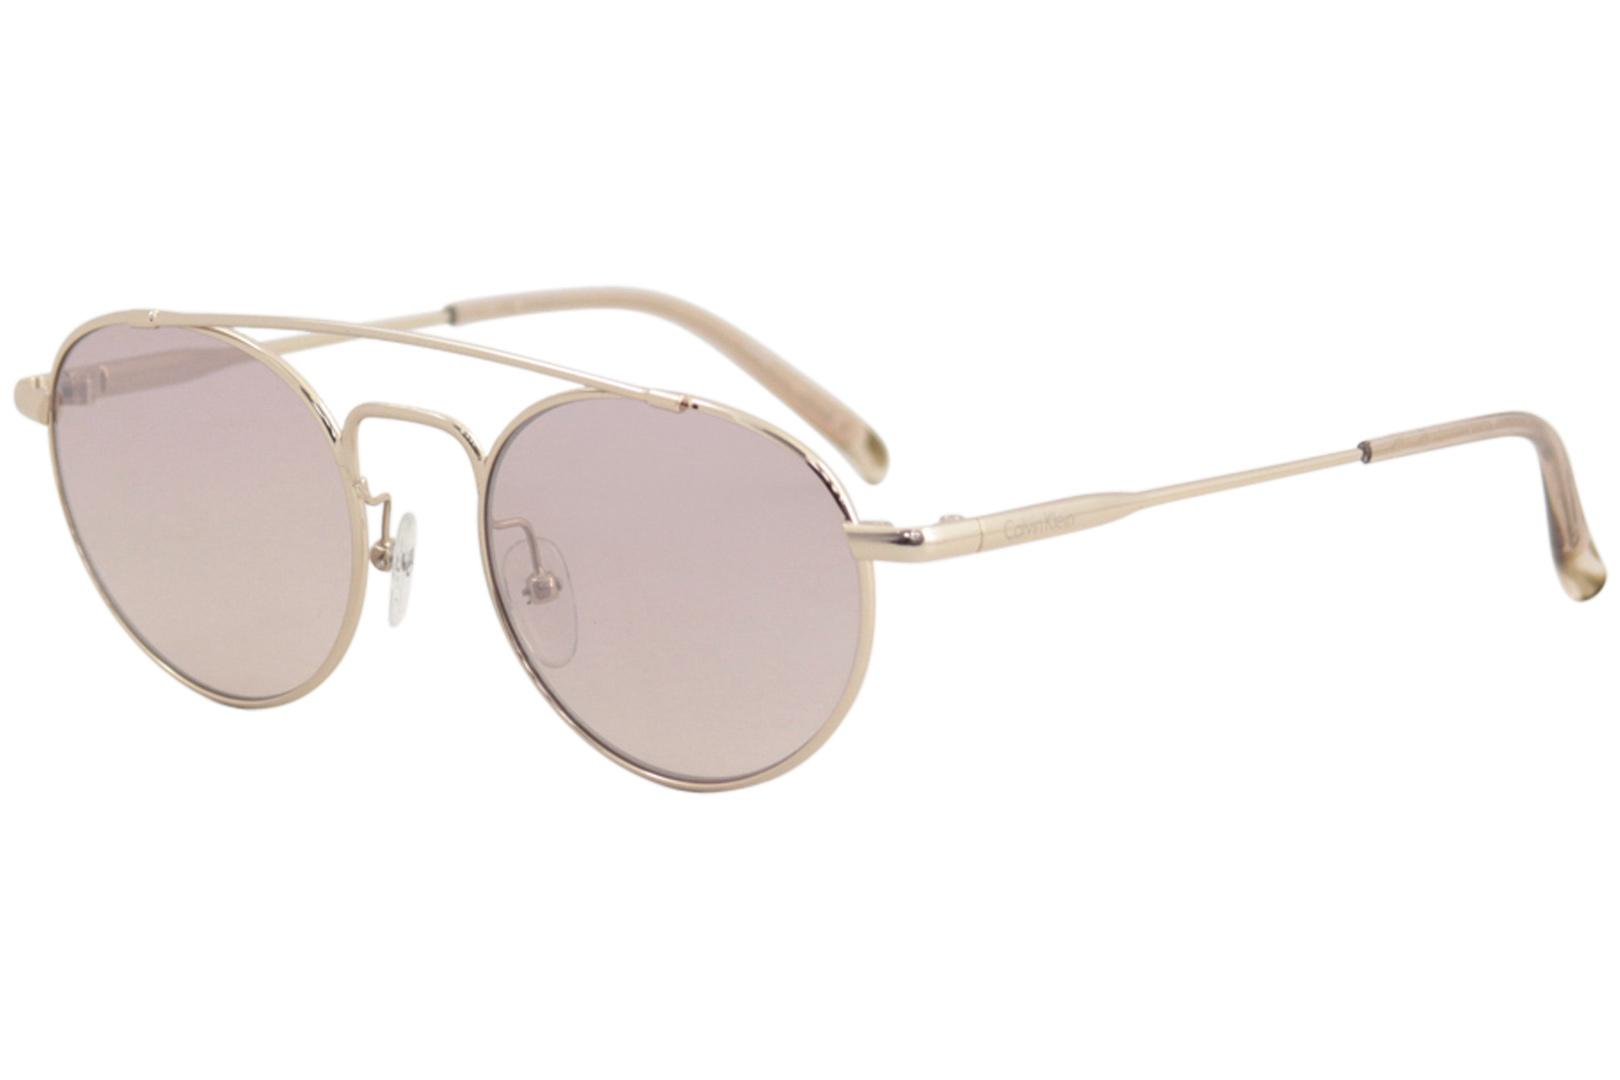 c46735f6e4 Calvin Klein Women s CK2148S CK 2148 S Fashion Pilot Sunglasses